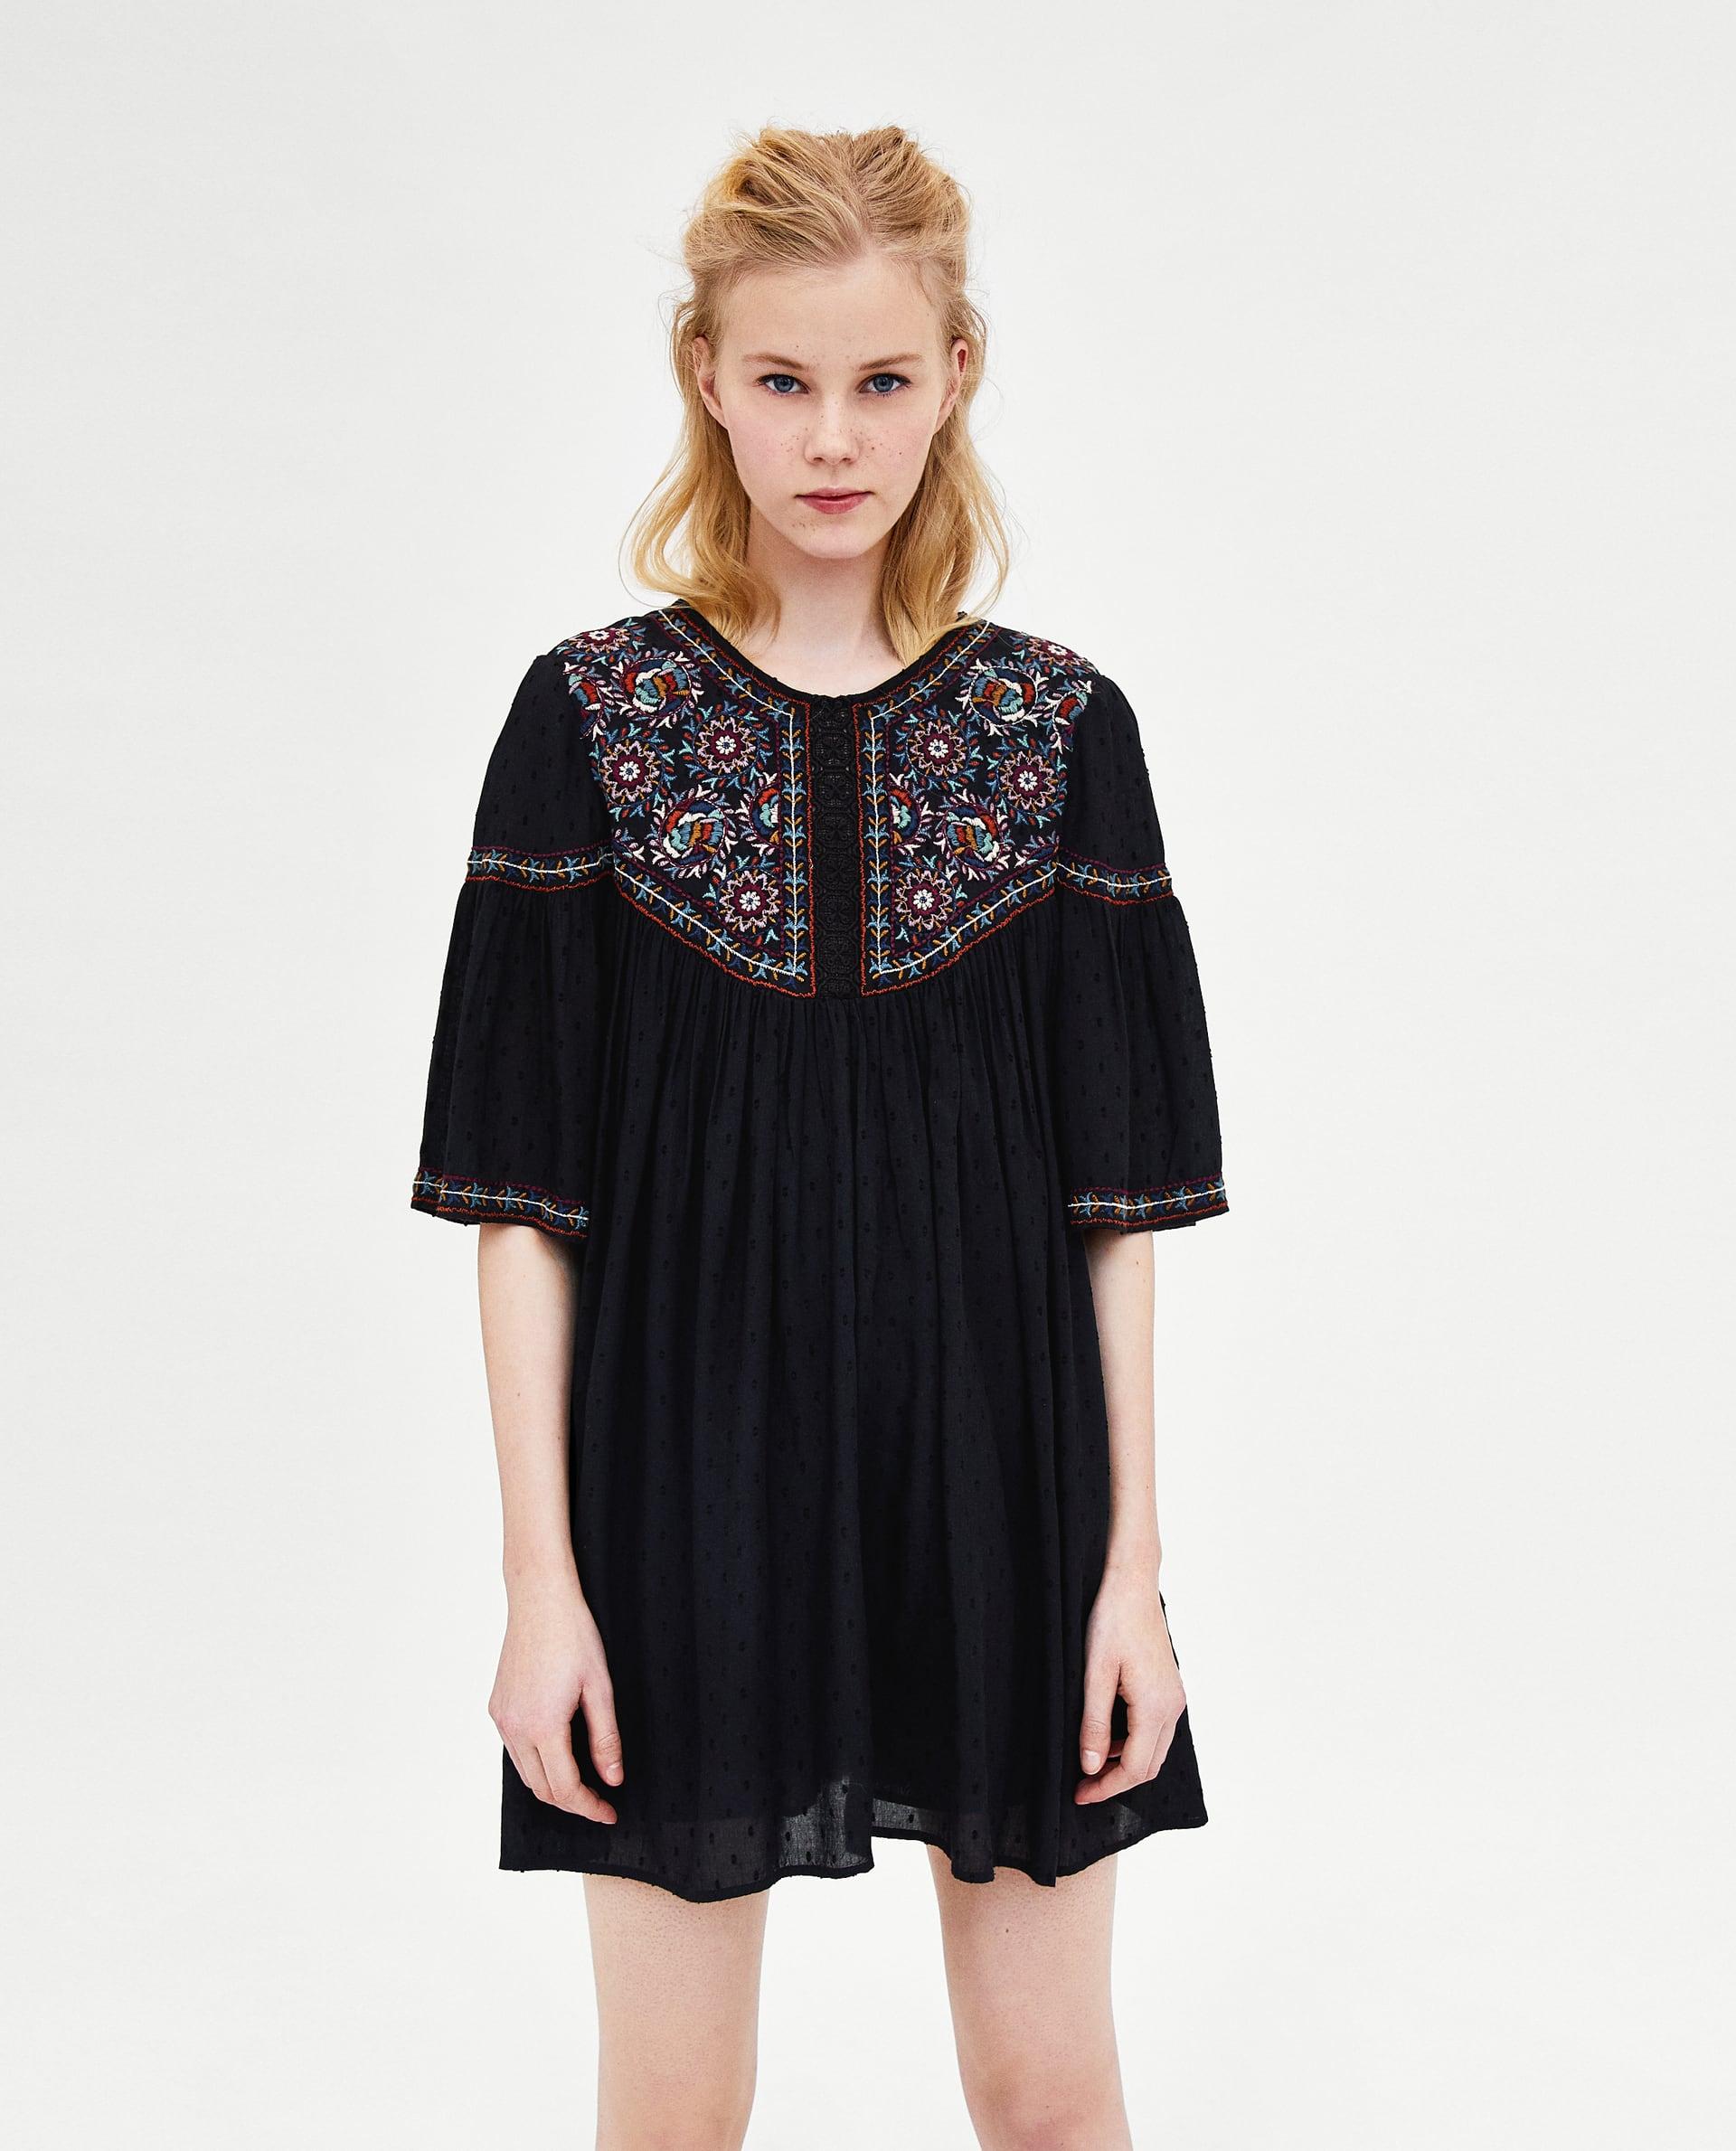 ZARA-LUMETIS-EMBROIDERED-DRESS-black.jpg